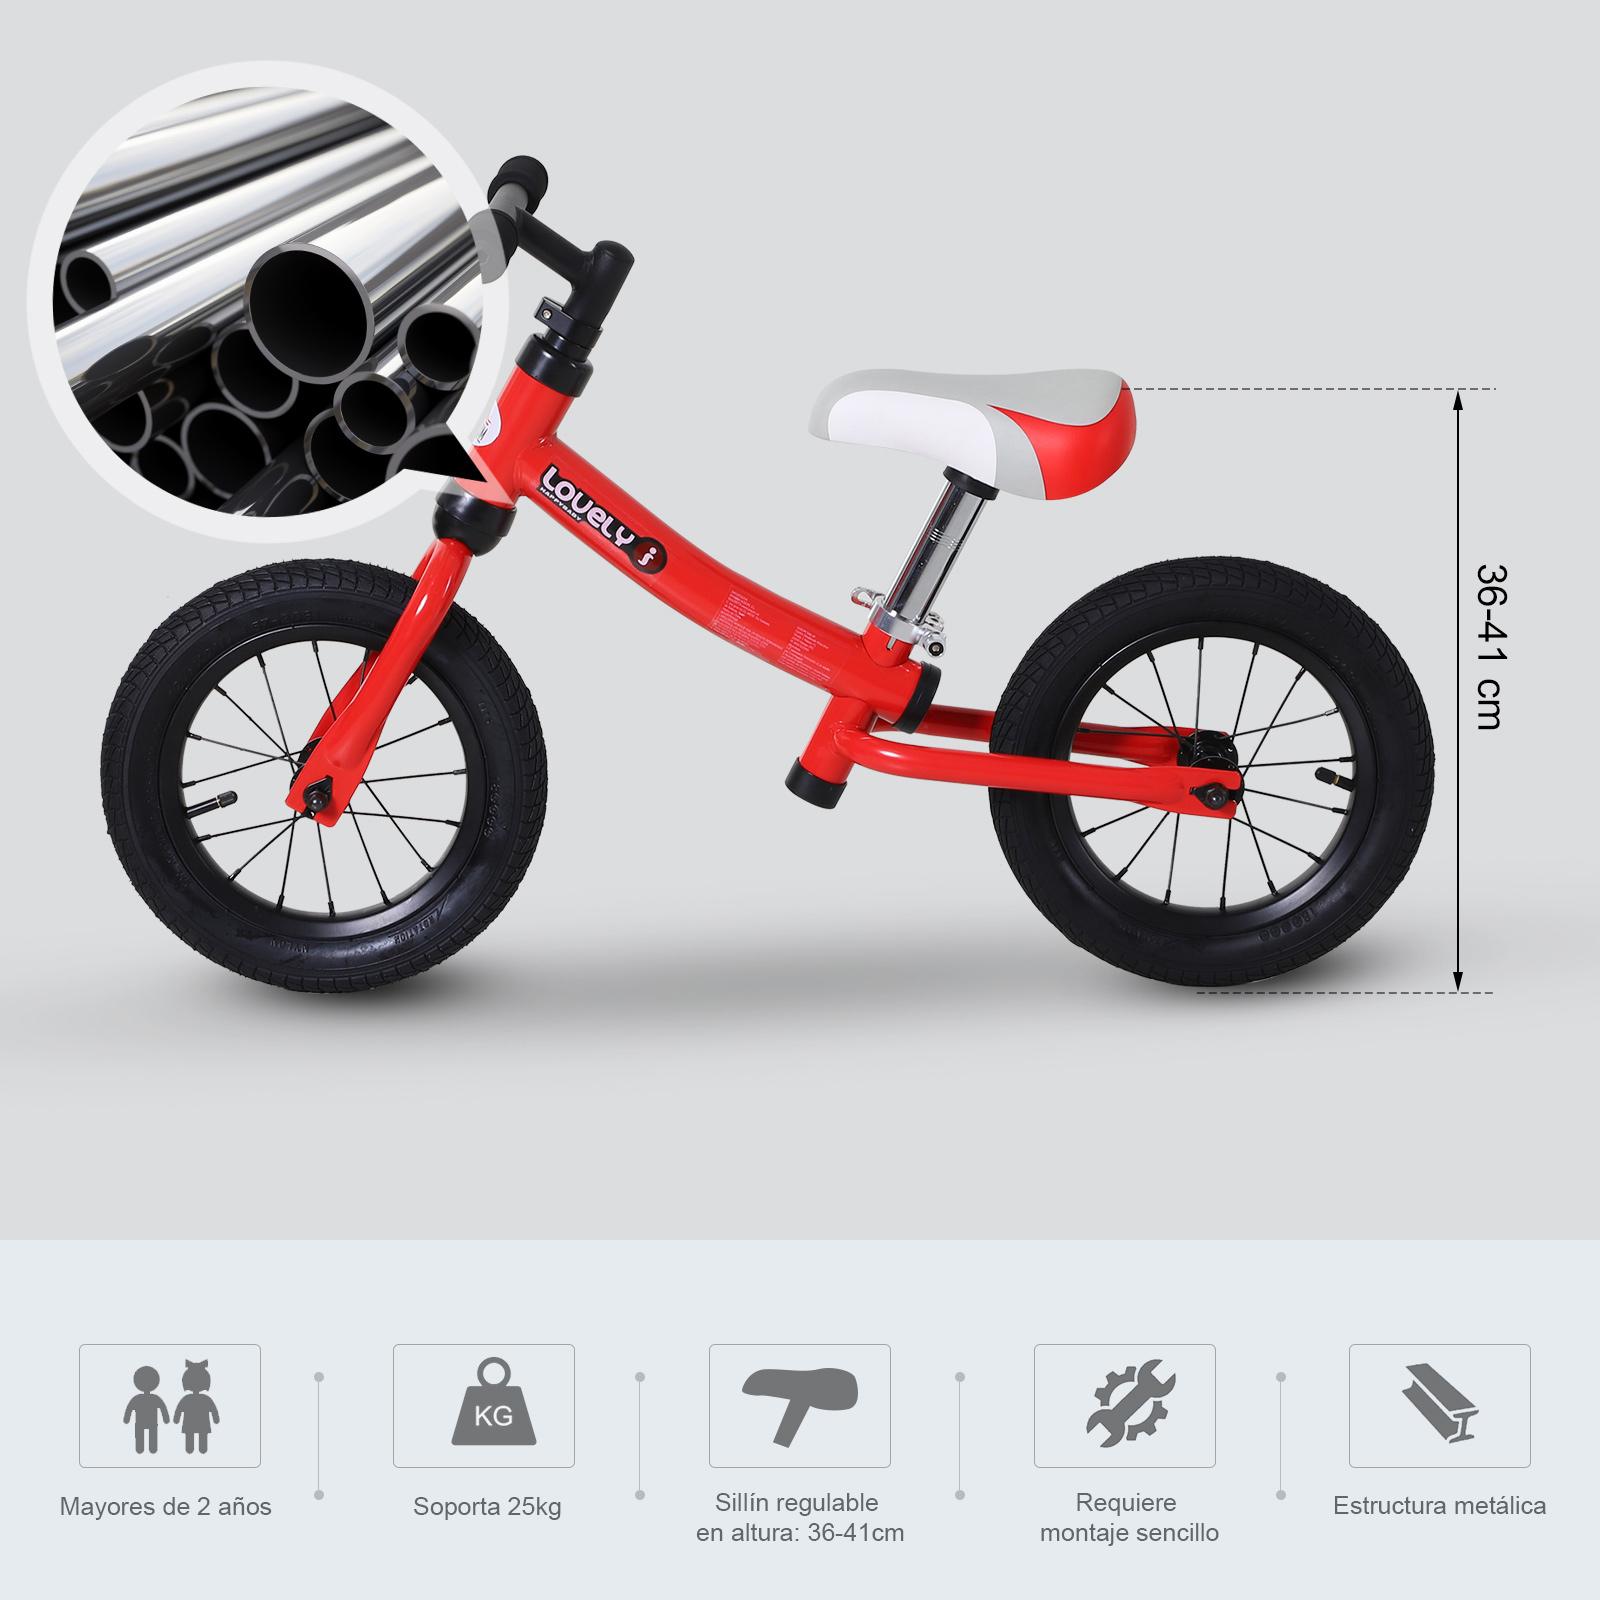 Bicicleta-sin-Pedales-de-Altura-de-Asiento-Regulable-31-45cm-2-5-Anos miniatura 17